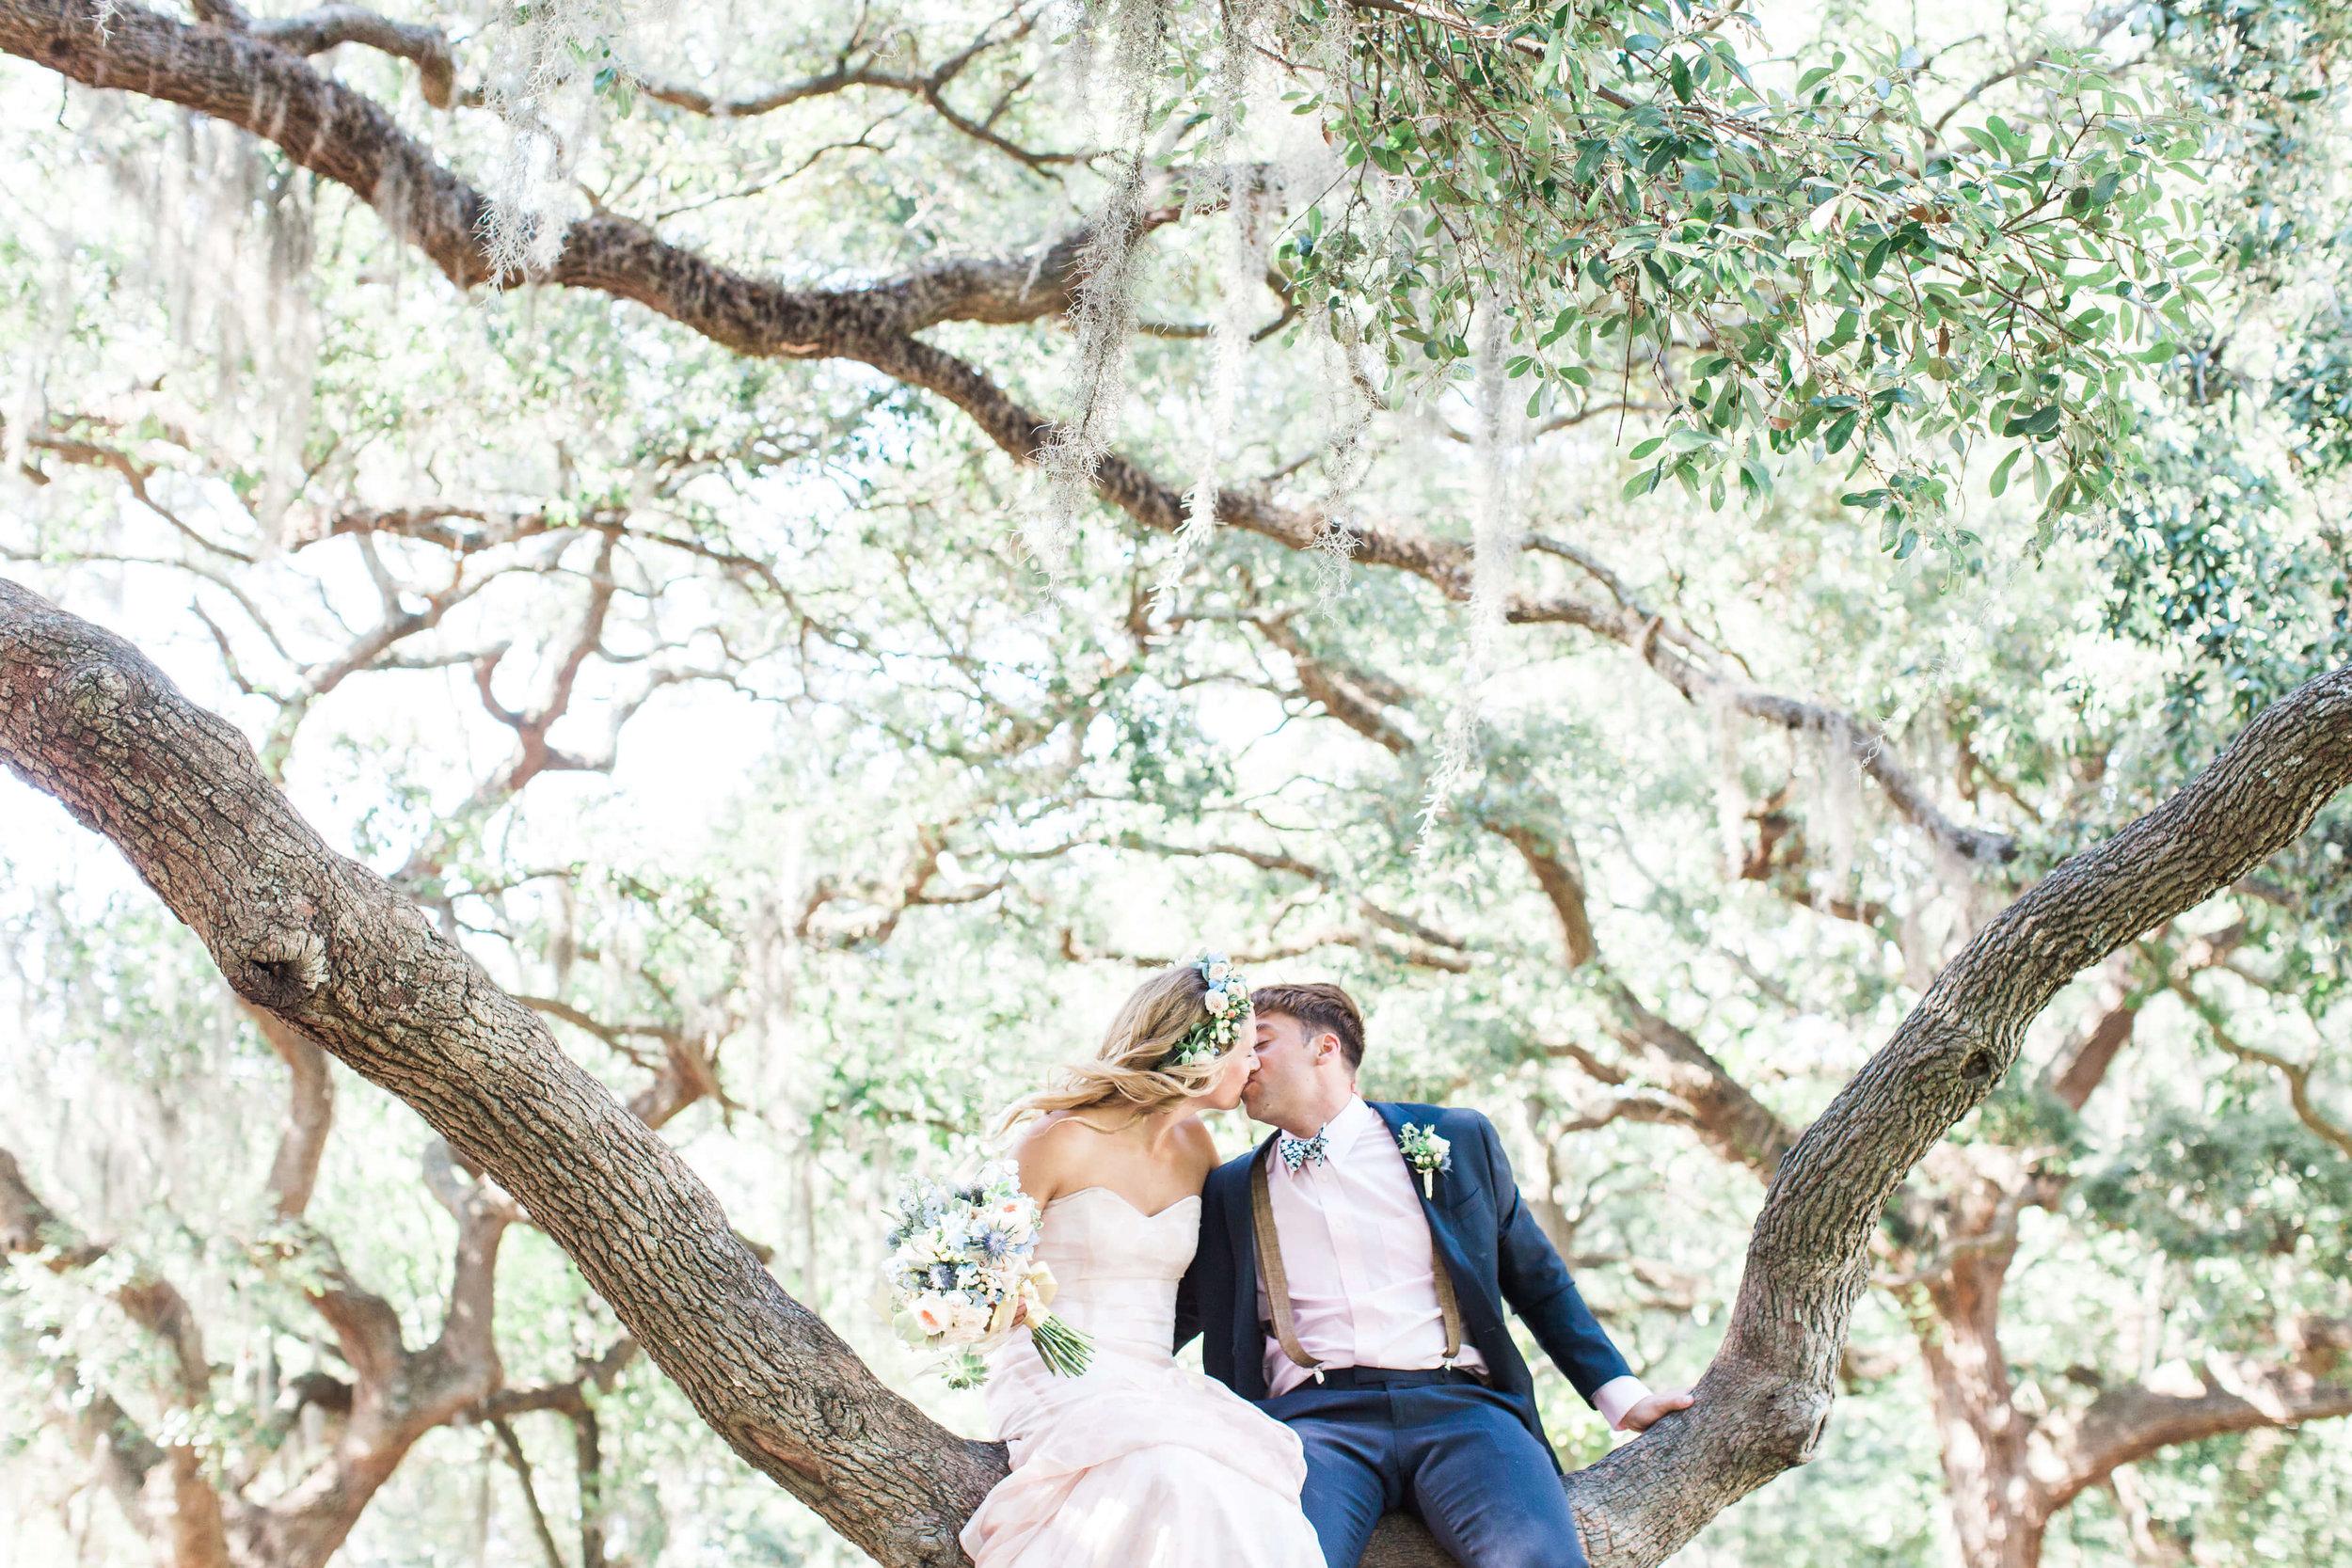 Eve Pat Wedding - Apt B Photography - Savannah wedding photographer, Soho South Wedding